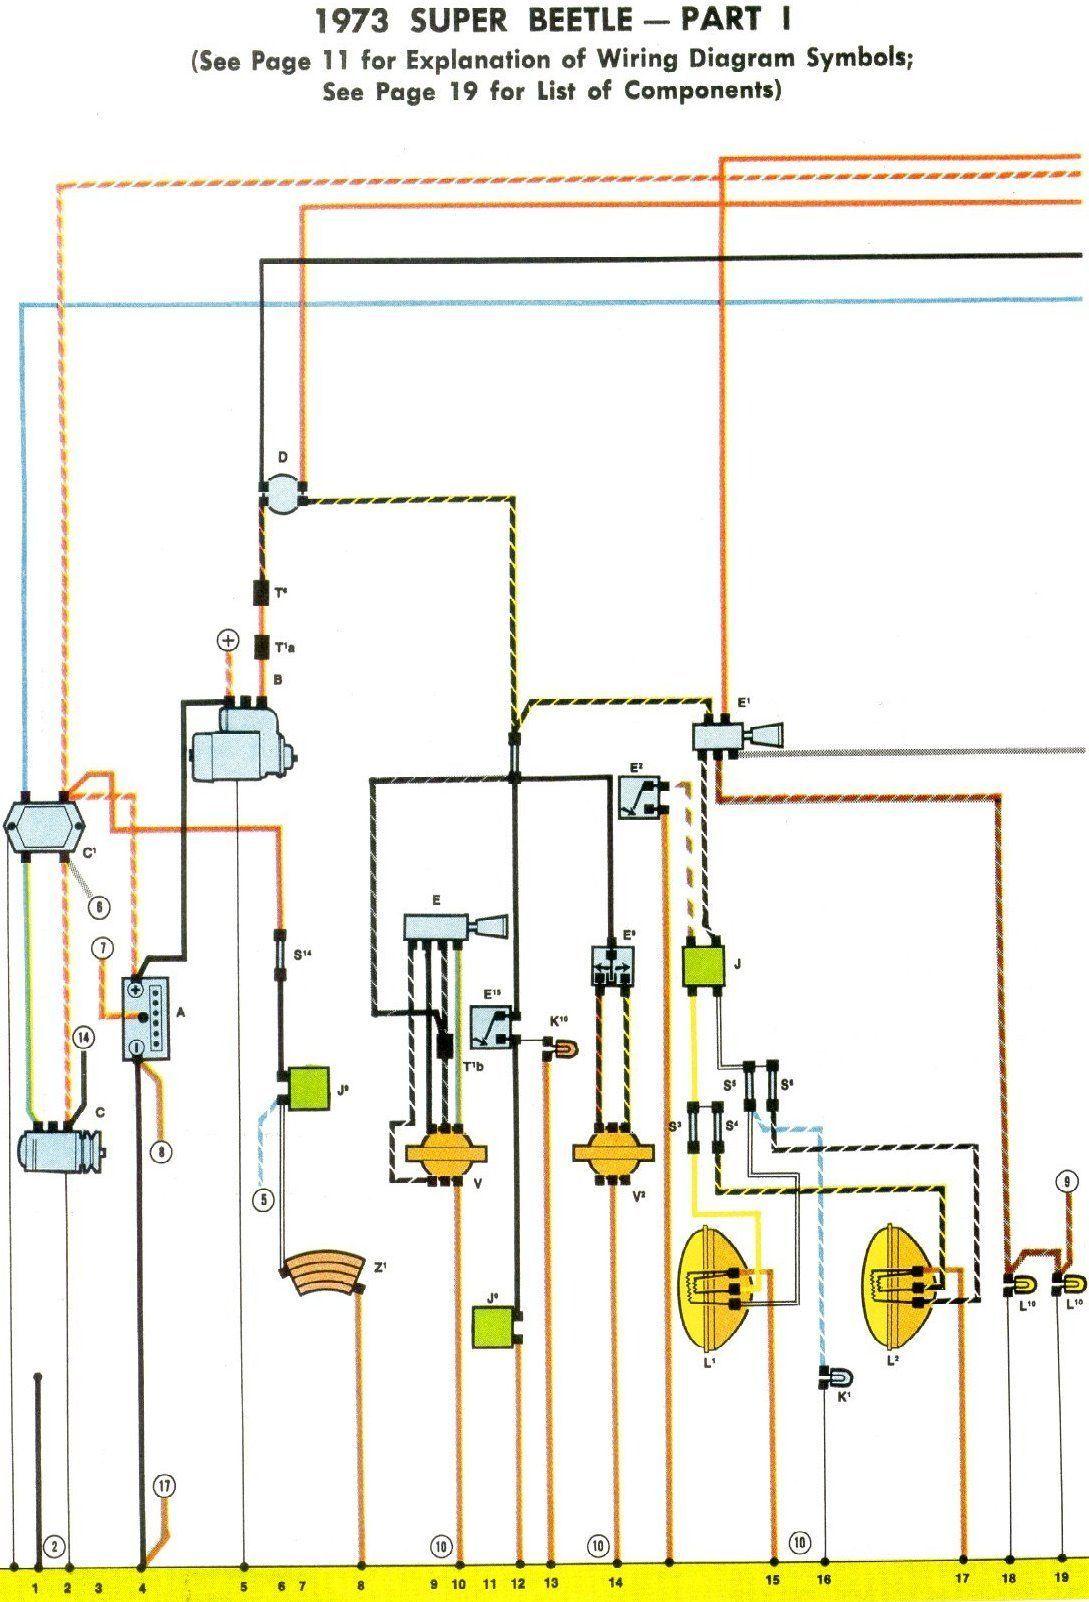 1973 vw super beetle engine wiring diagram | schematic and wiring diagram | vw  super beetle, vw beetles, beetle  pinterest